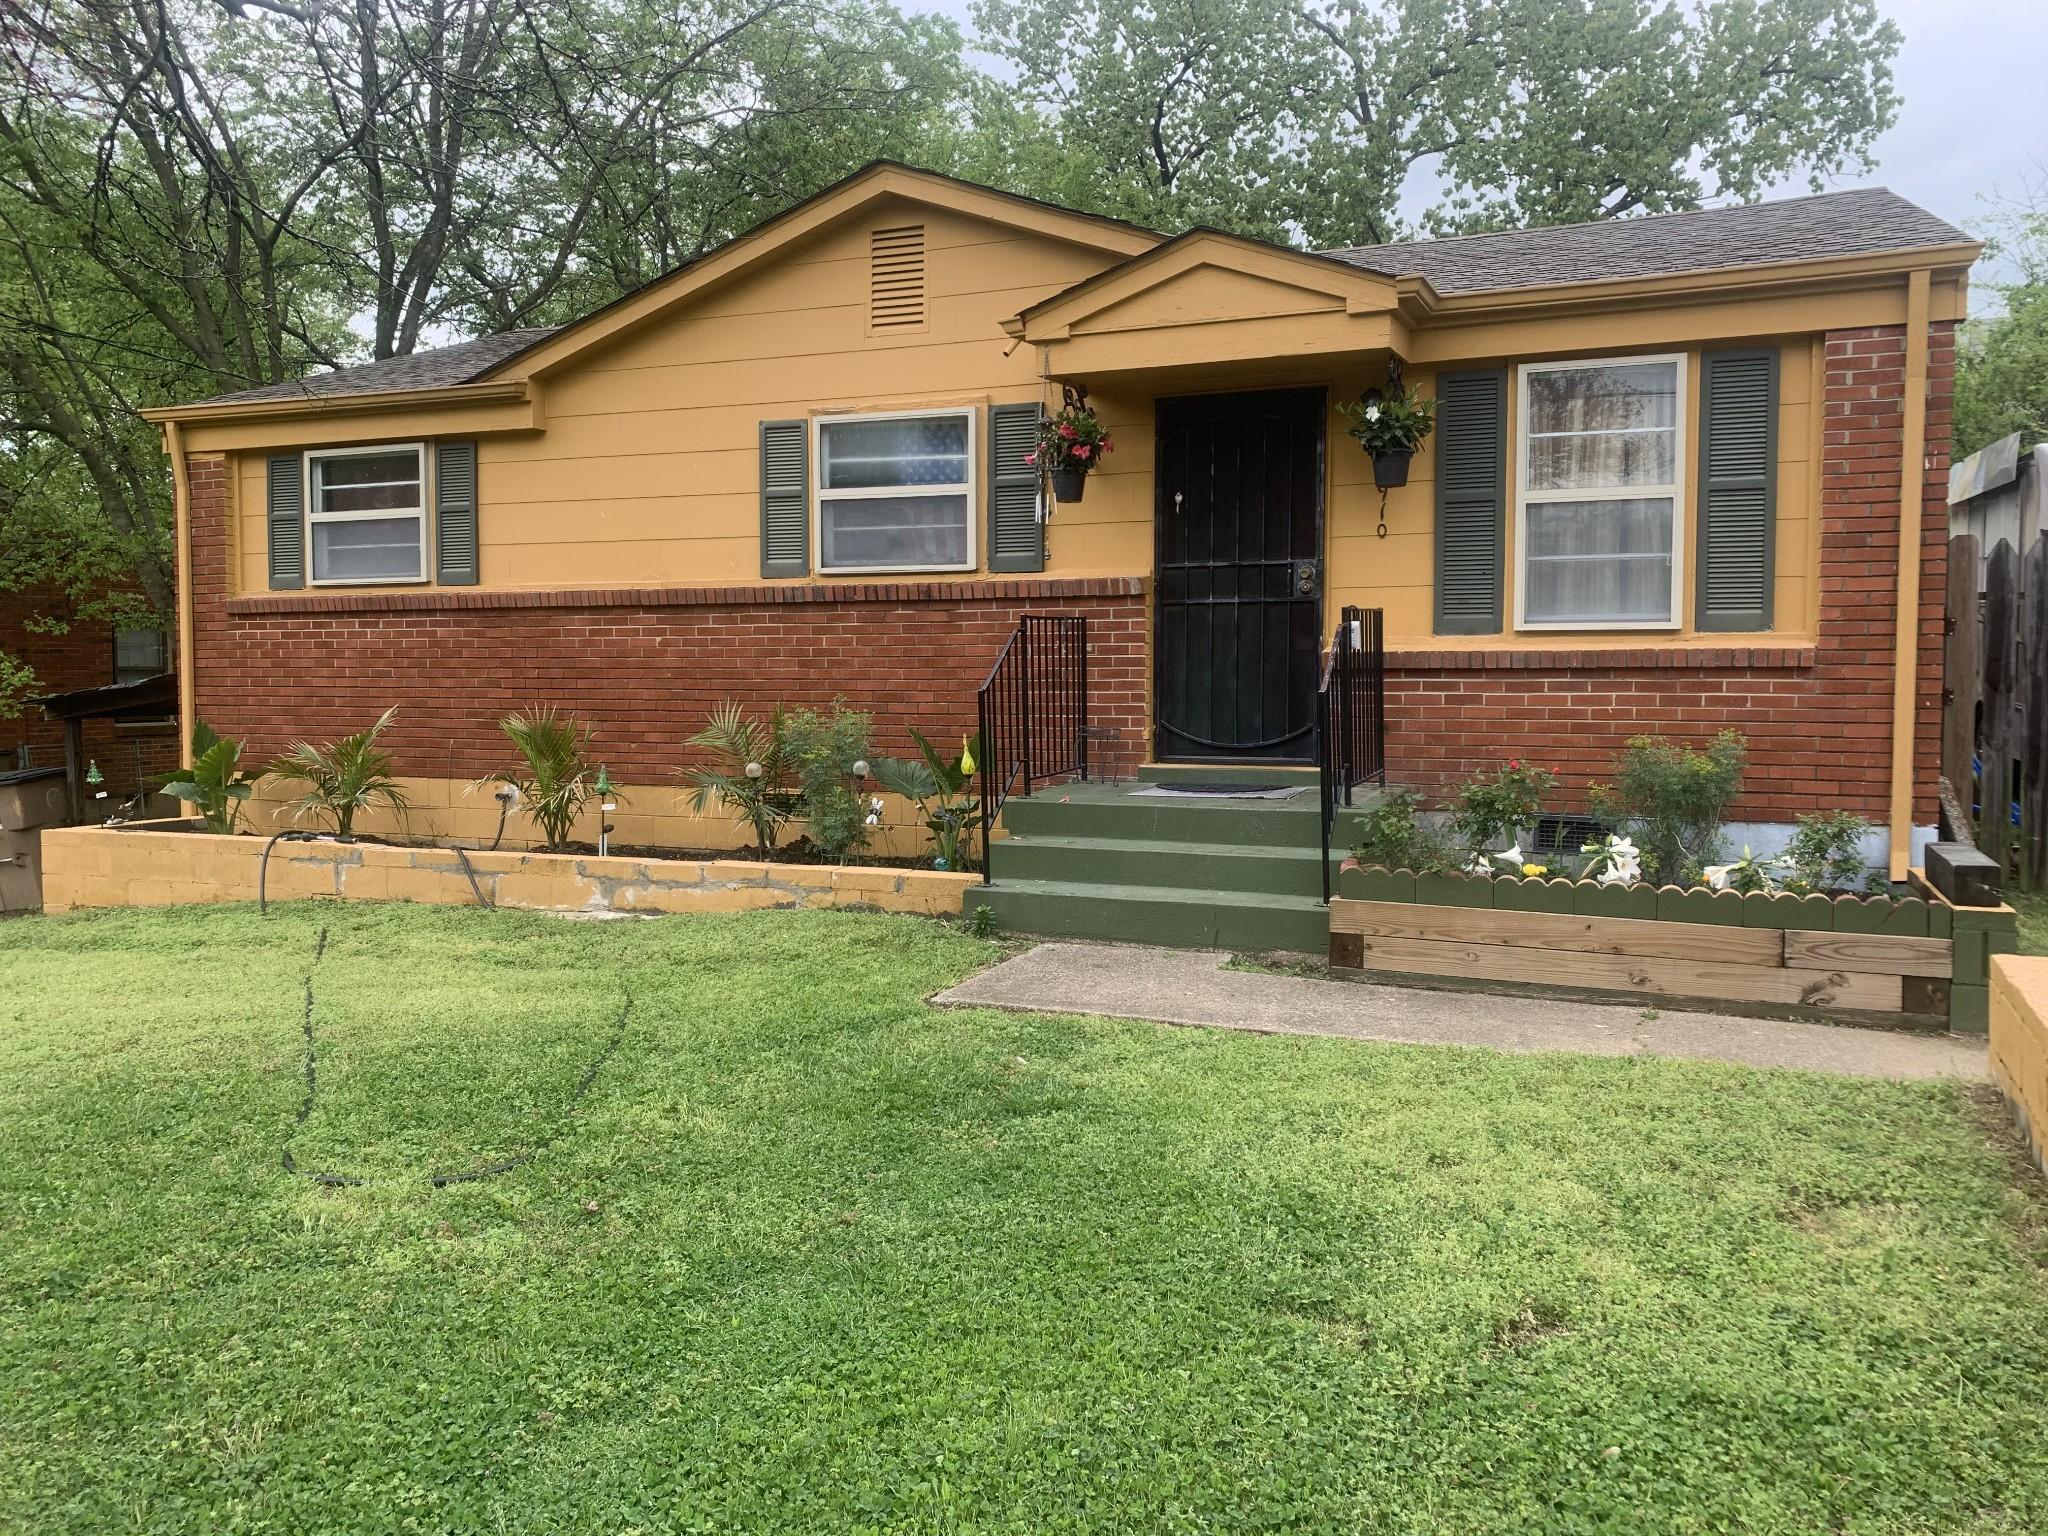 1910 Dabbs Ave, Nashville, TN 37217 - Nashville, TN real estate listing